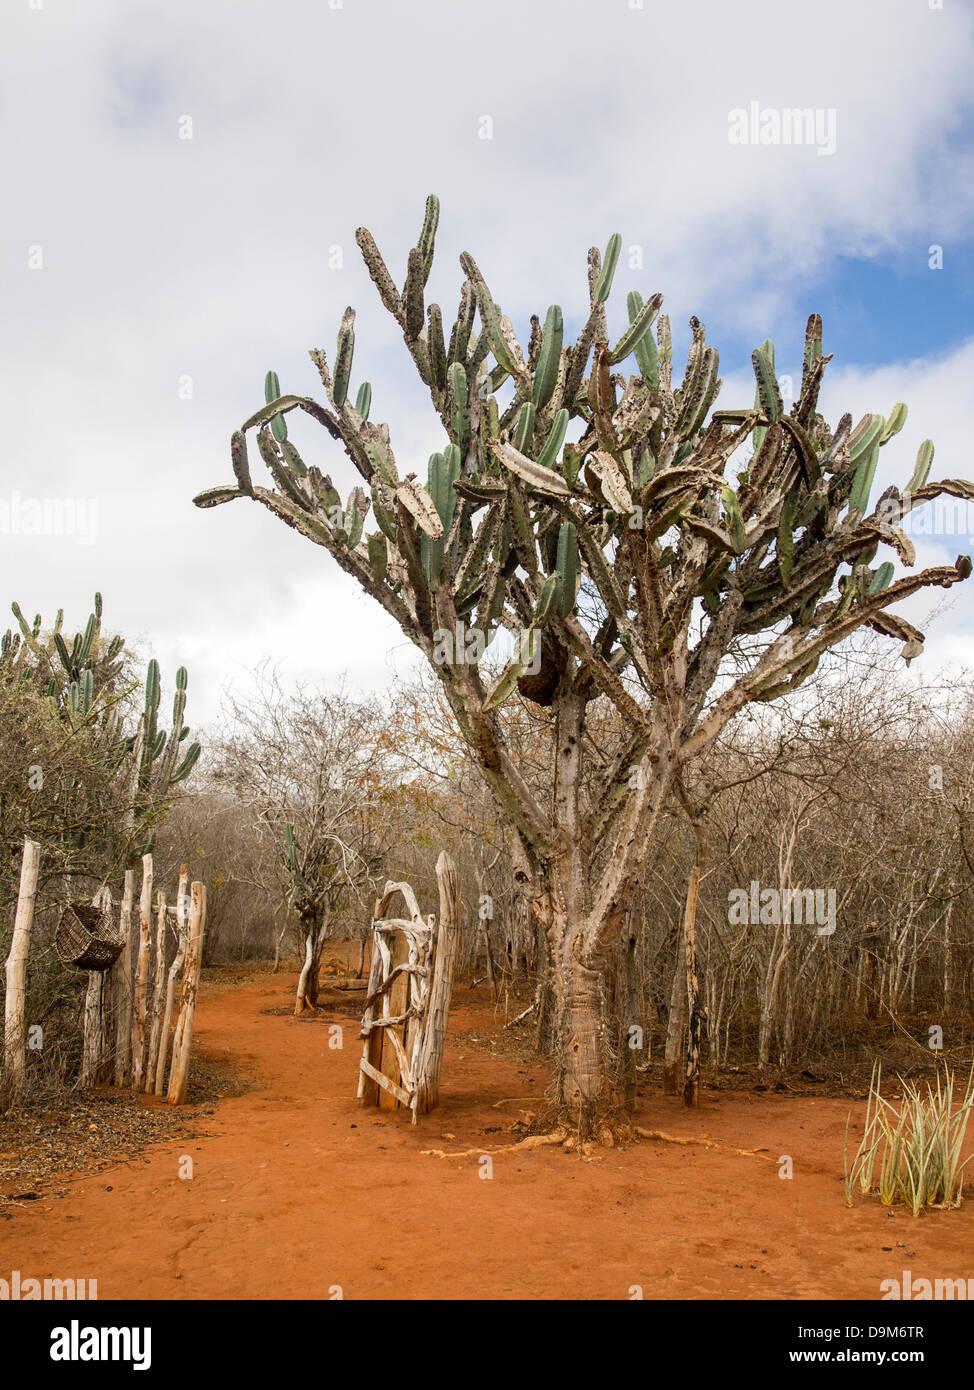 Cactus in Chapada Diamantina National Park in Brazil. - Stock Image